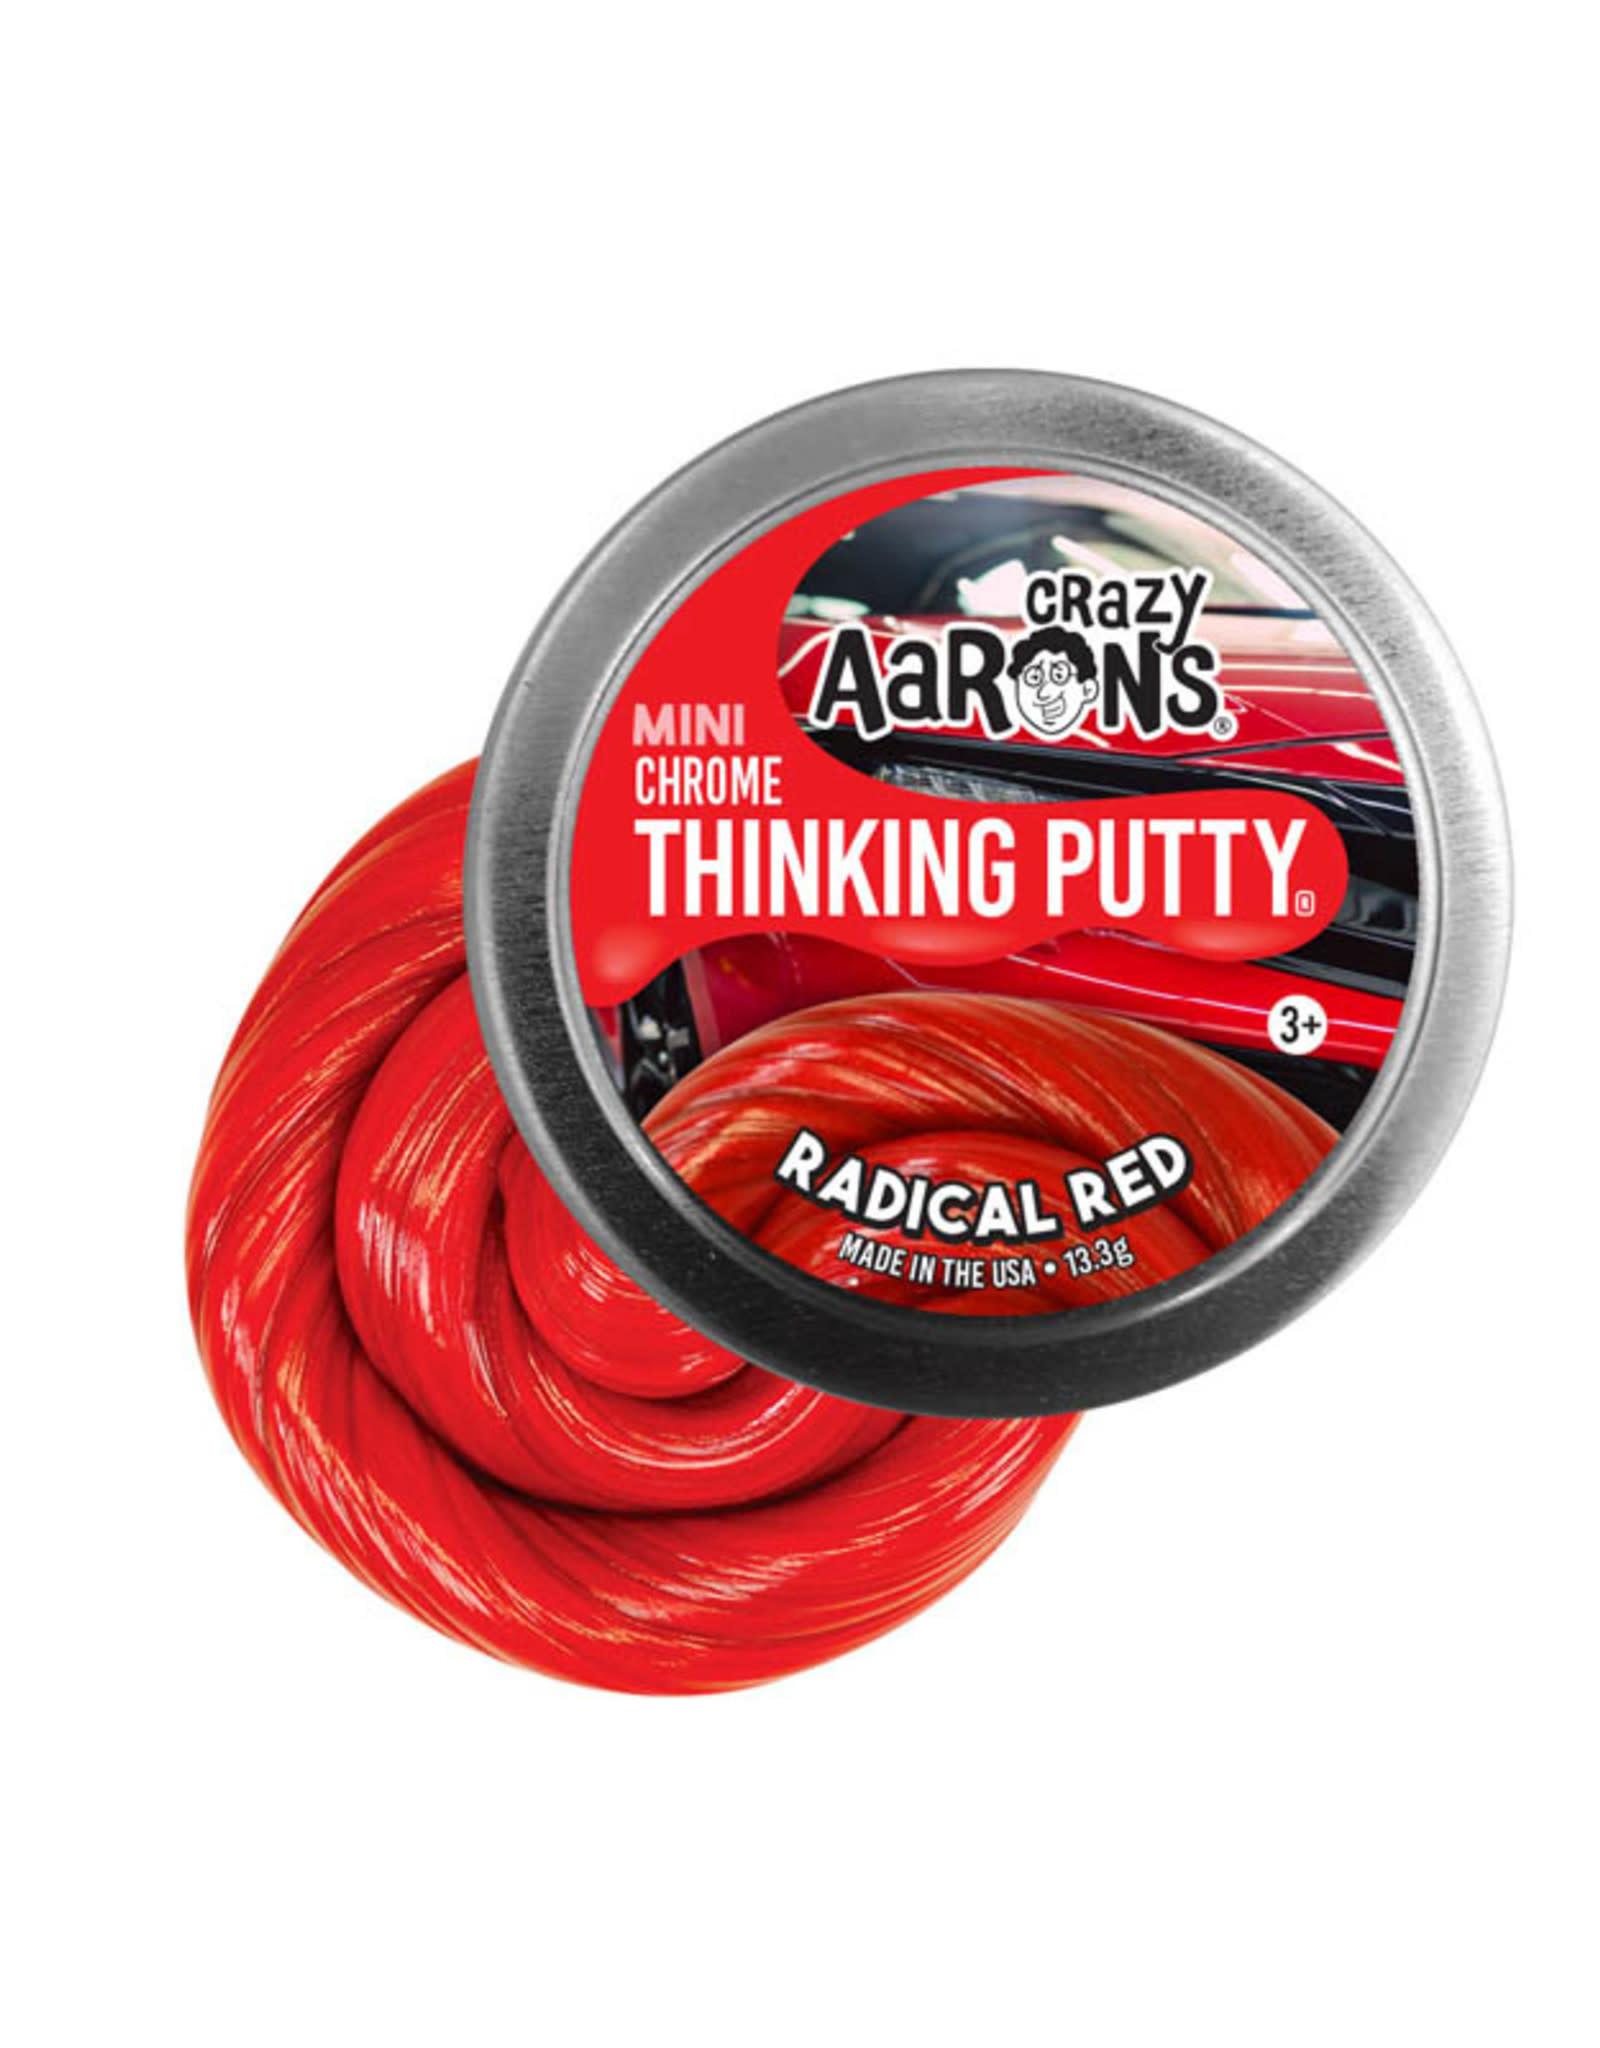 Crazy Aaron's Crazy Aaron's Small Tin - Radical Red